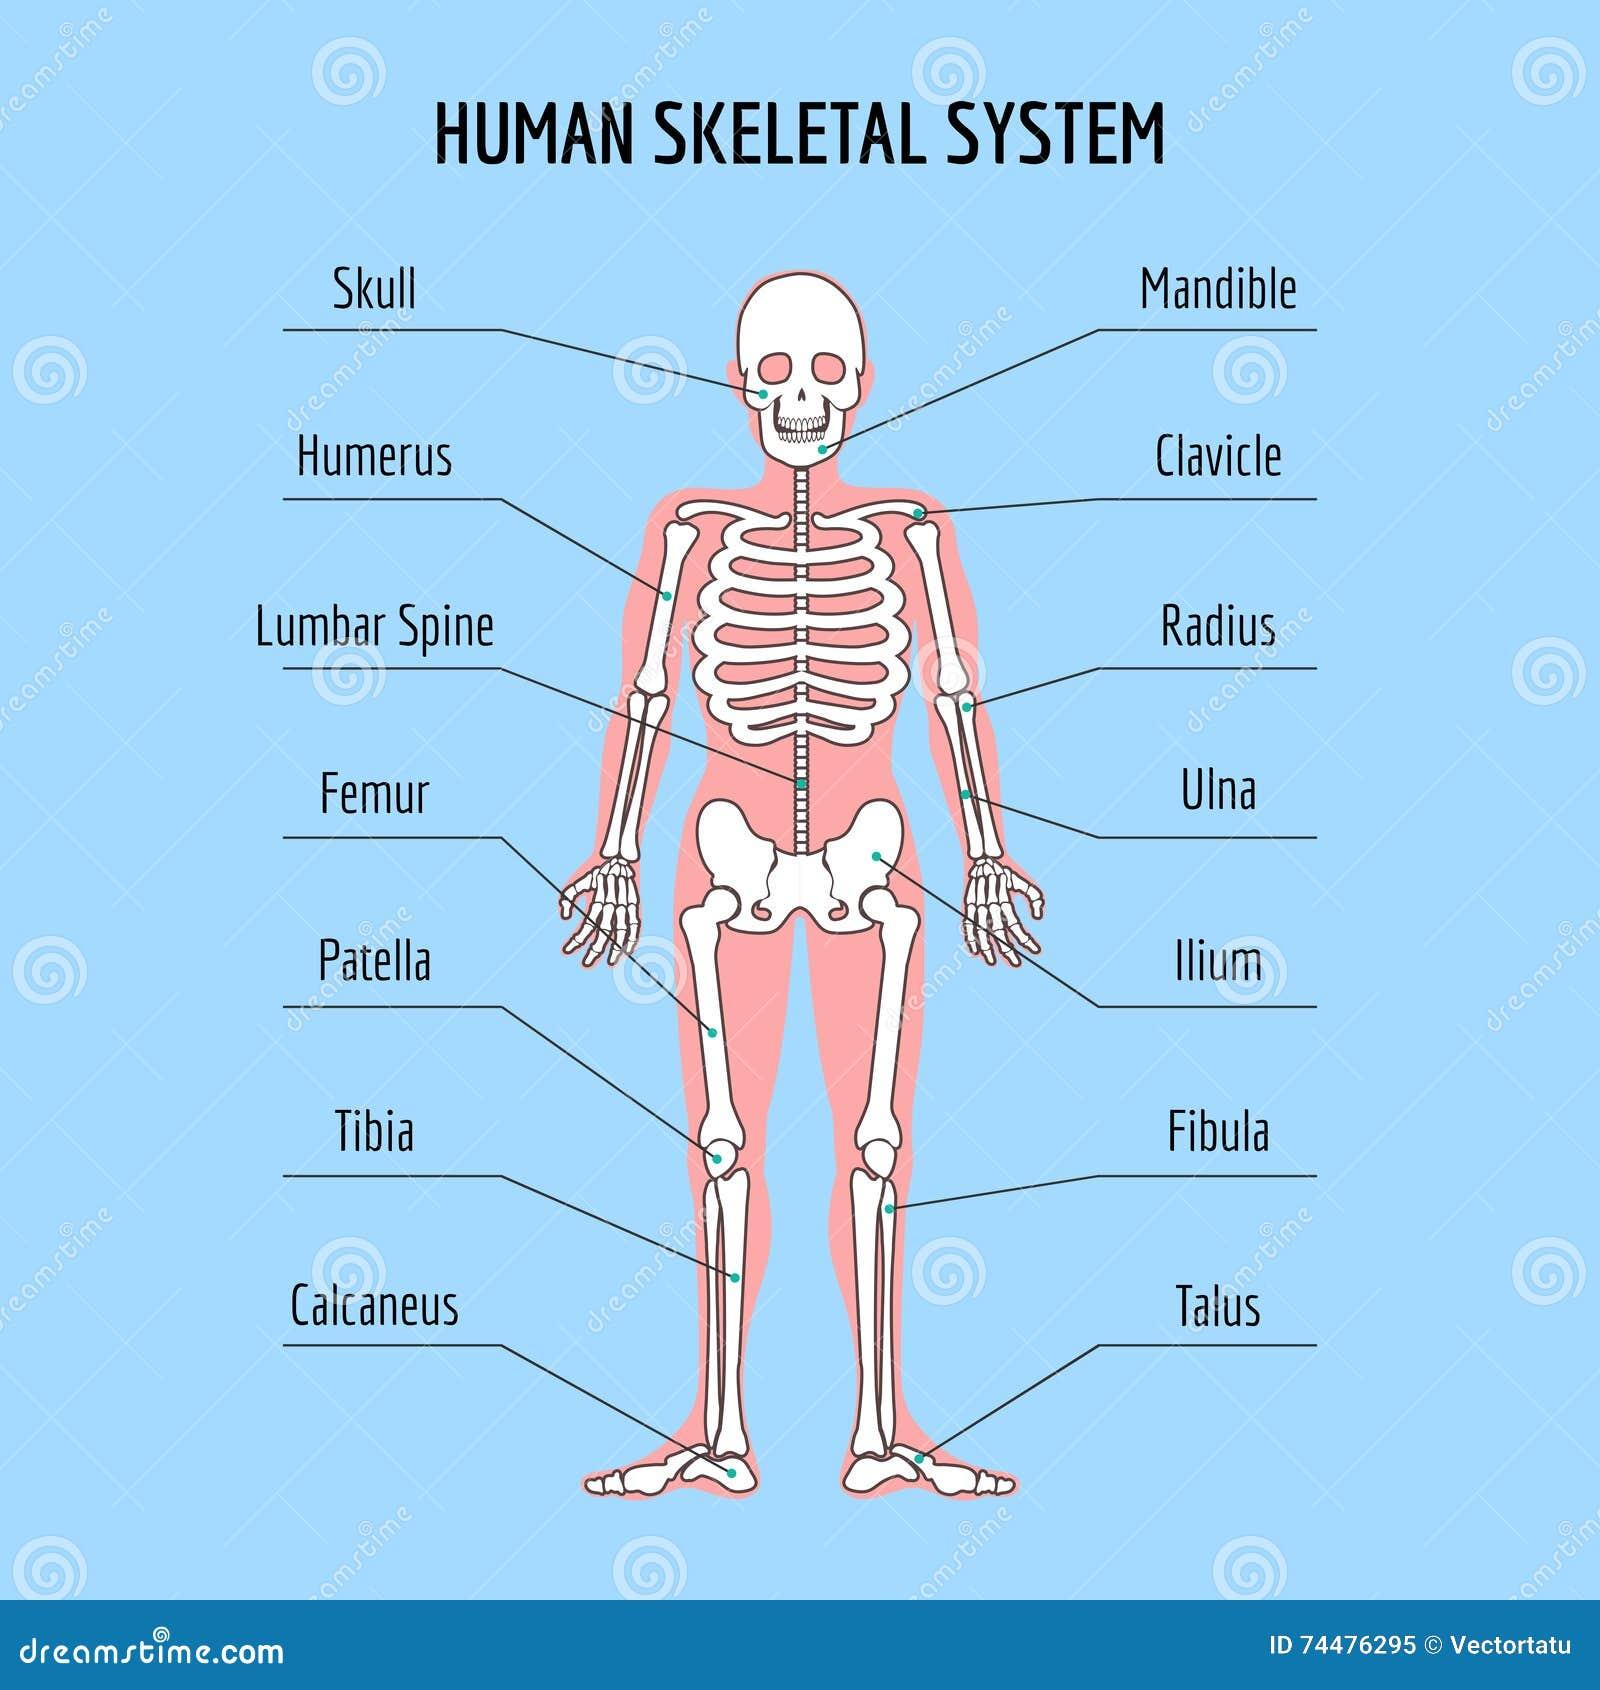 Human Skeletal System Stock Vector Illustration Of Patella 74476295